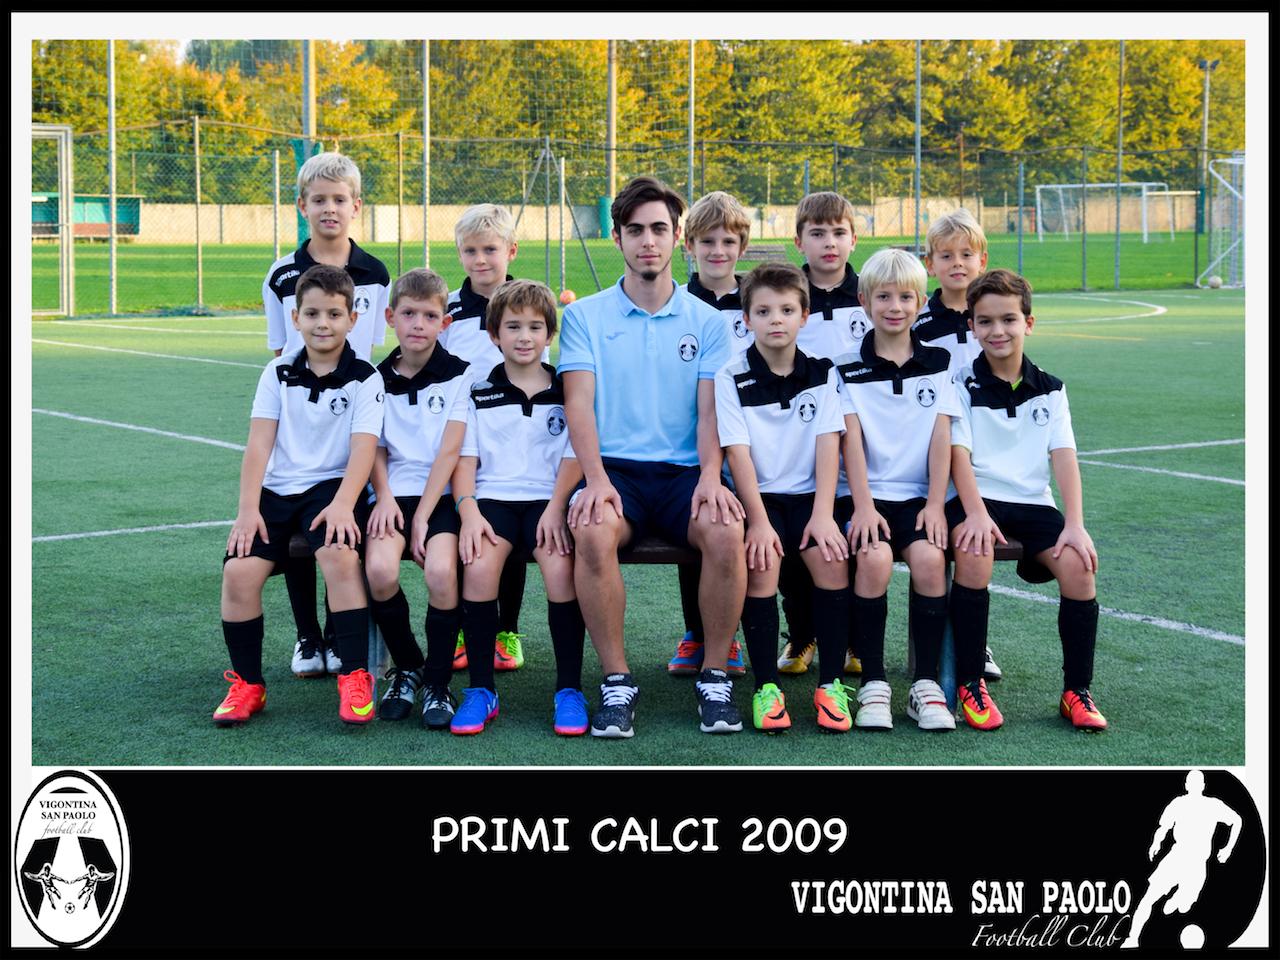 2009 Primi Calci